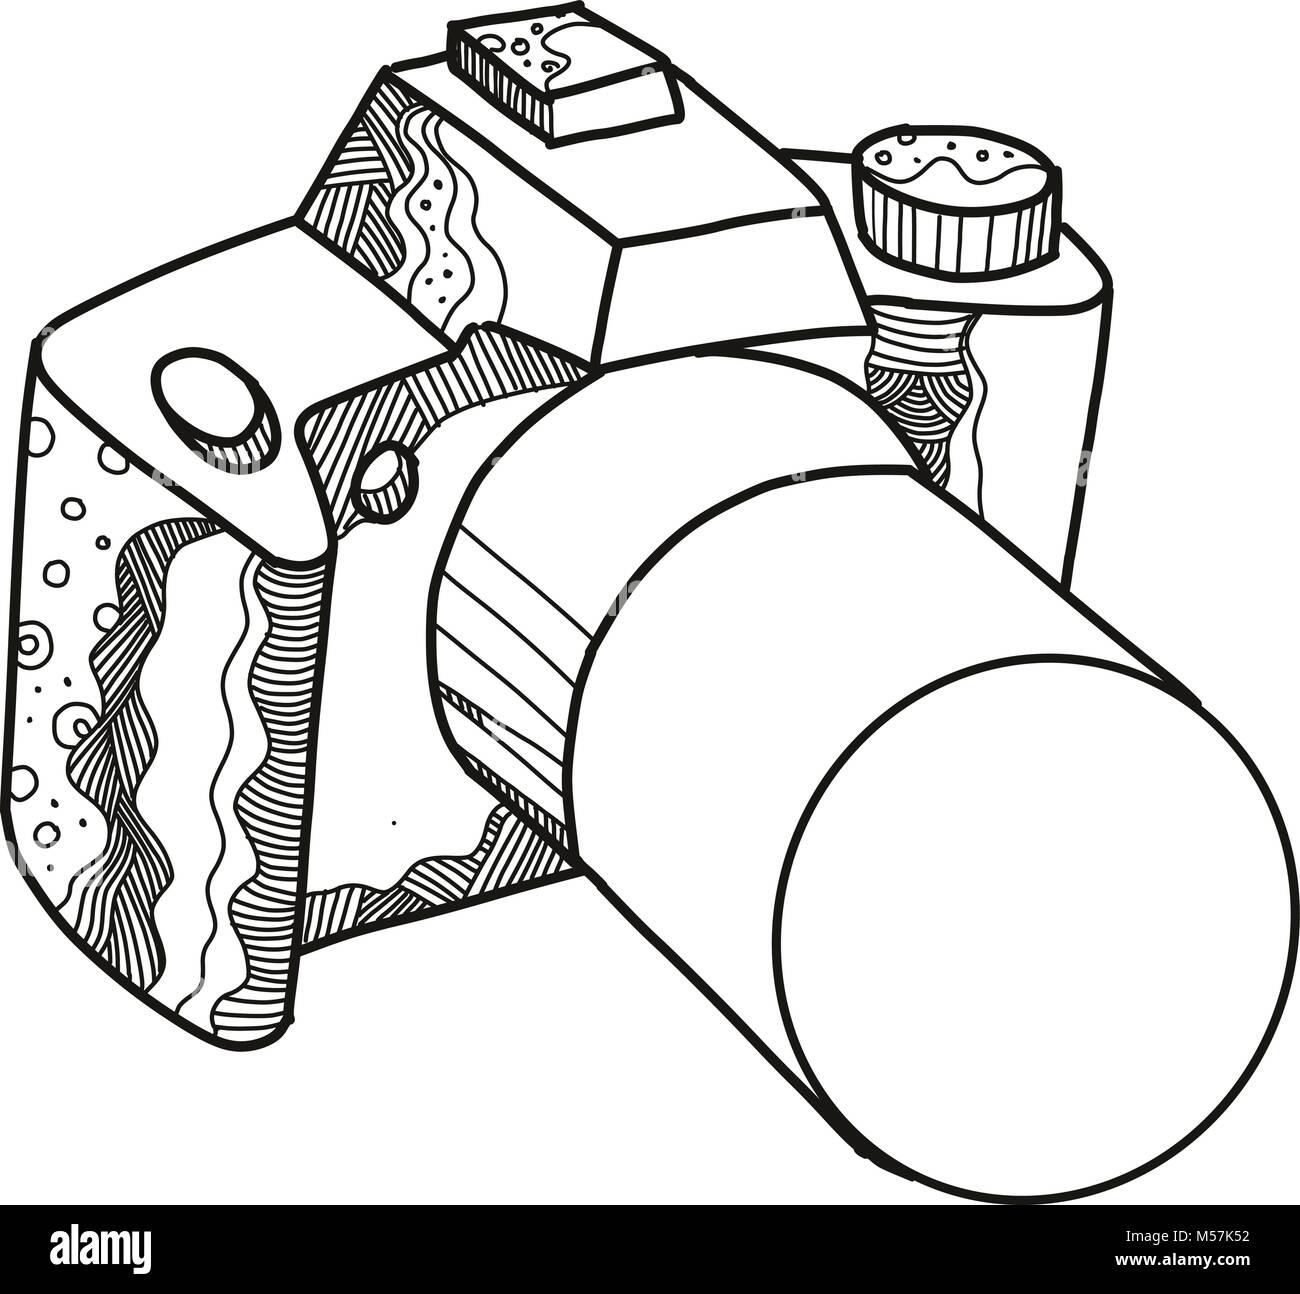 Doodle art illustration of a DSLR camera, digital SLR or digital single-lens reflex camera done in mandala style. - Stock Vector